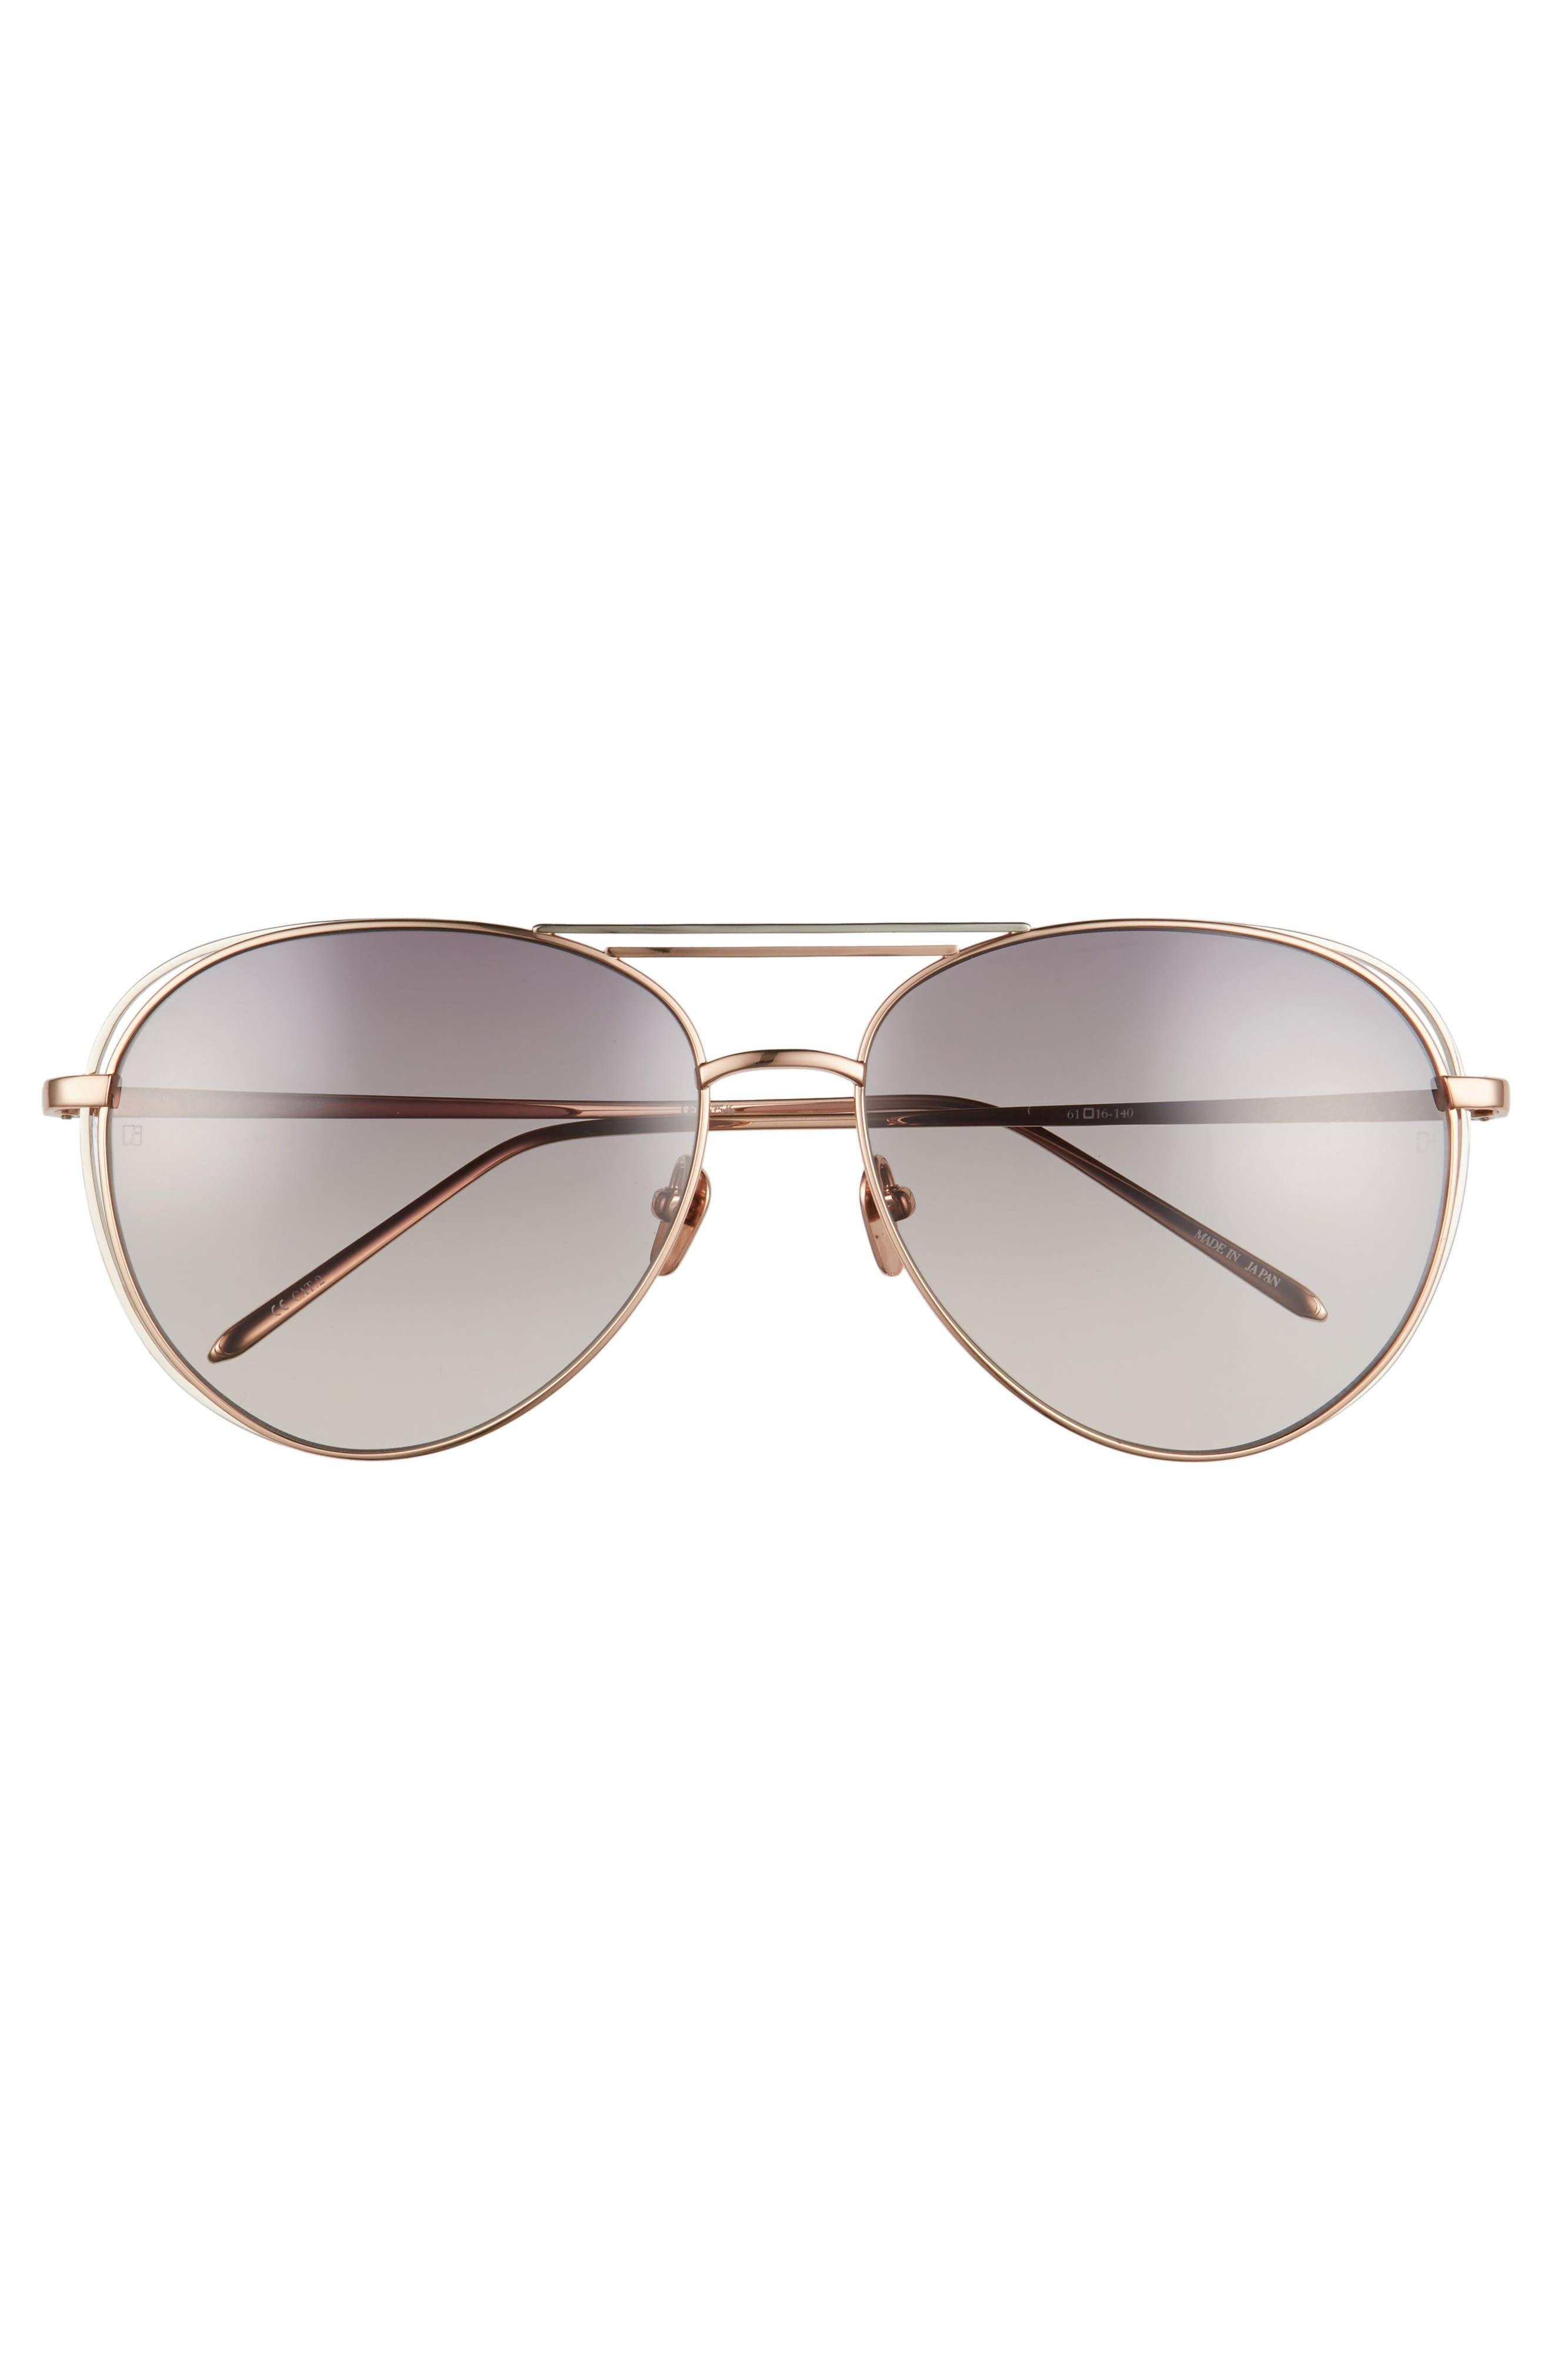 61mm 18 Karat Gold Aviator Sunglasses,                             Alternate thumbnail 9, color,